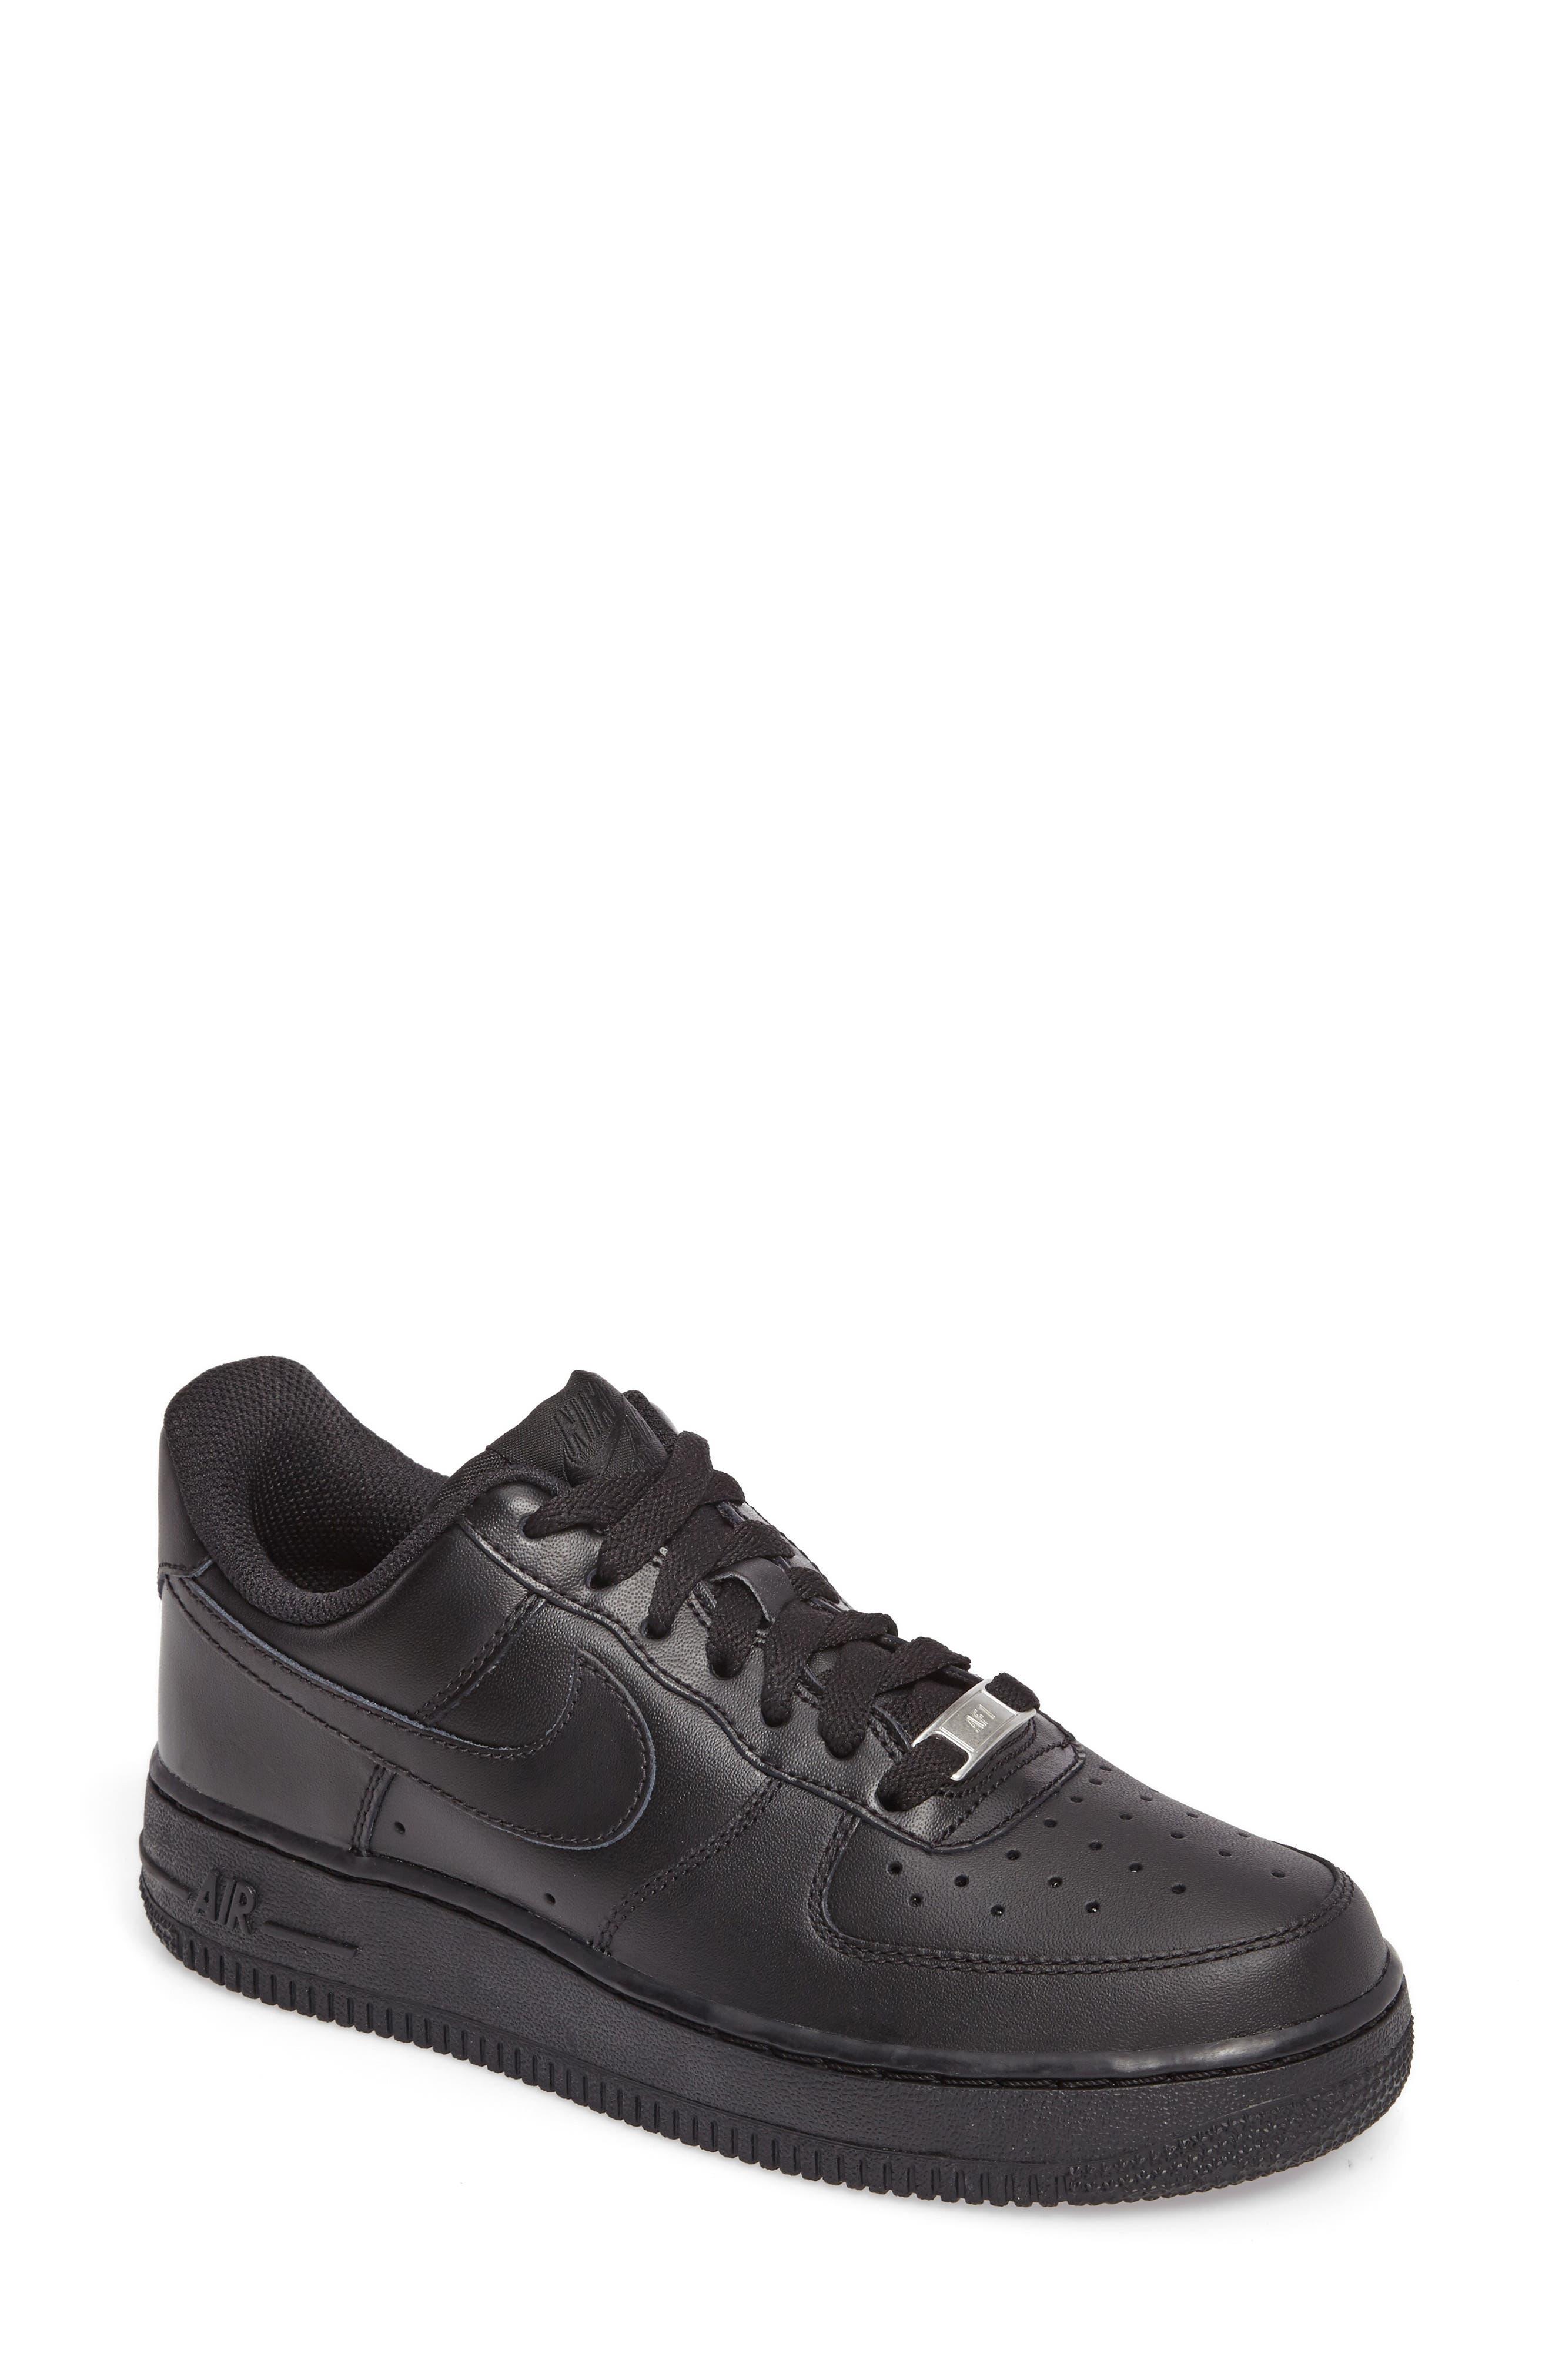 NIKE, 'Air Force 1' Basketball Sneaker, Main thumbnail 1, color, BLACK/ BLACK